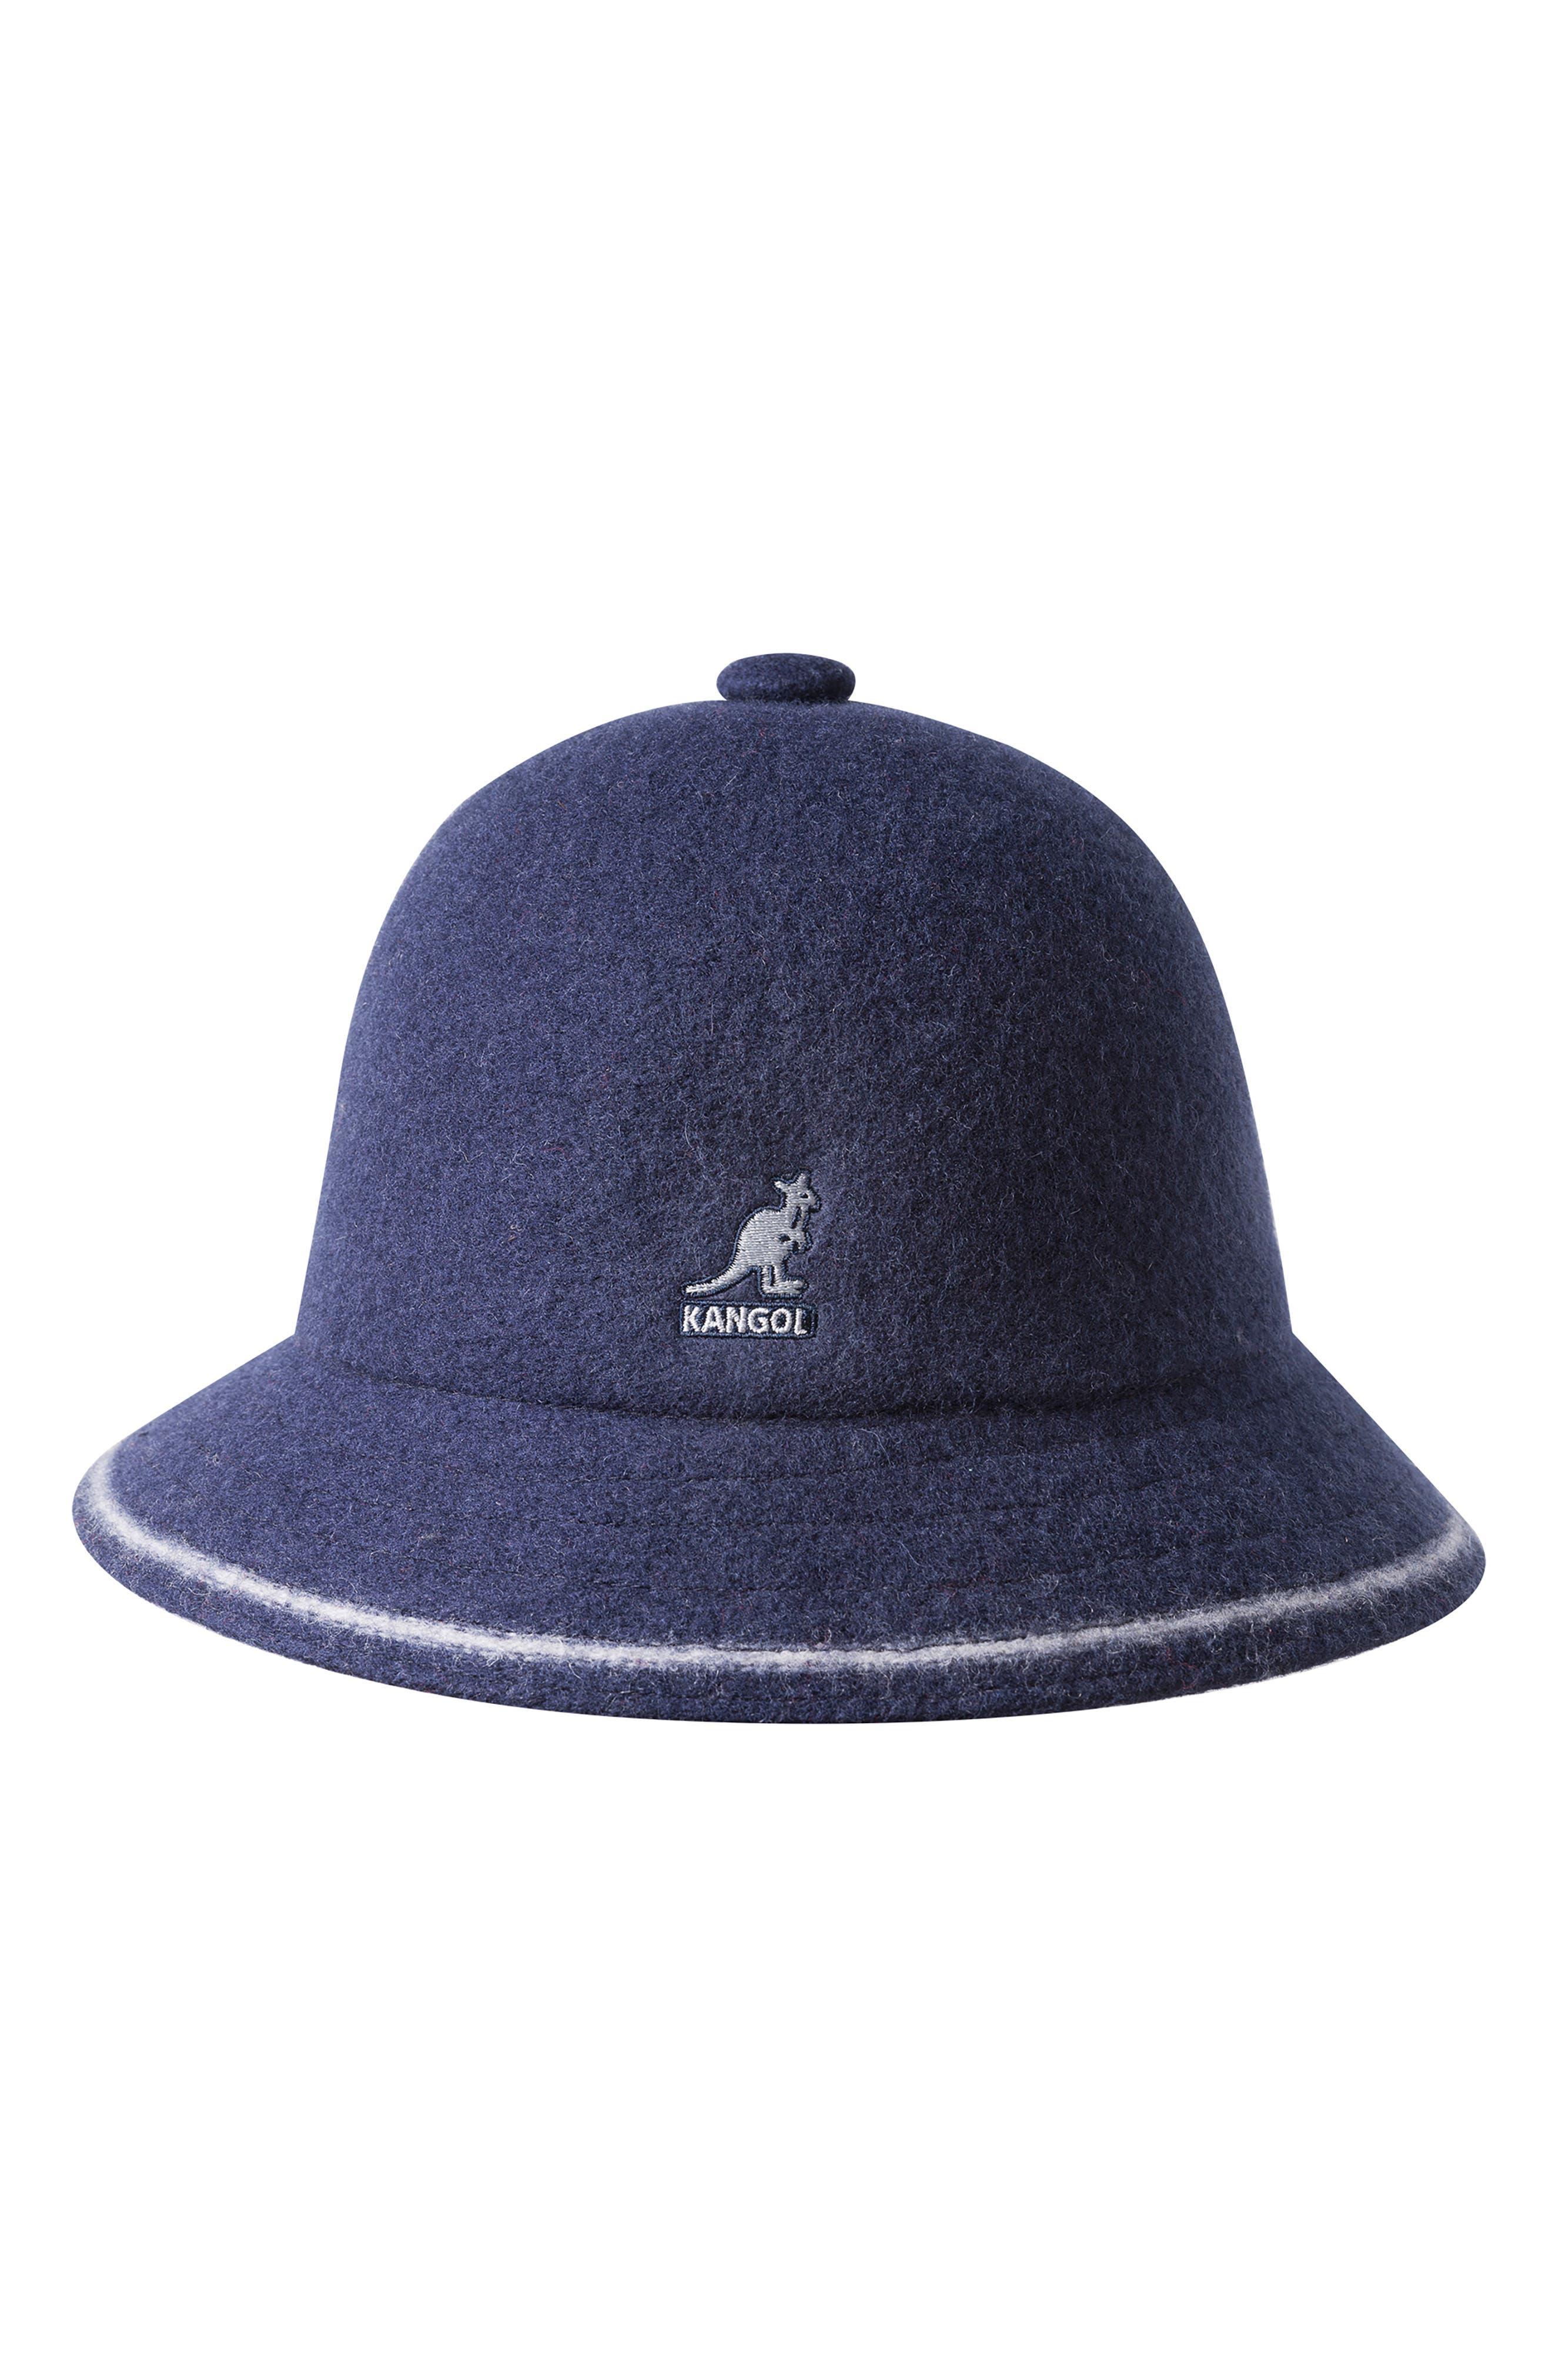 KANGOL Cloche Hat - Blue in Navy/ Off Wht